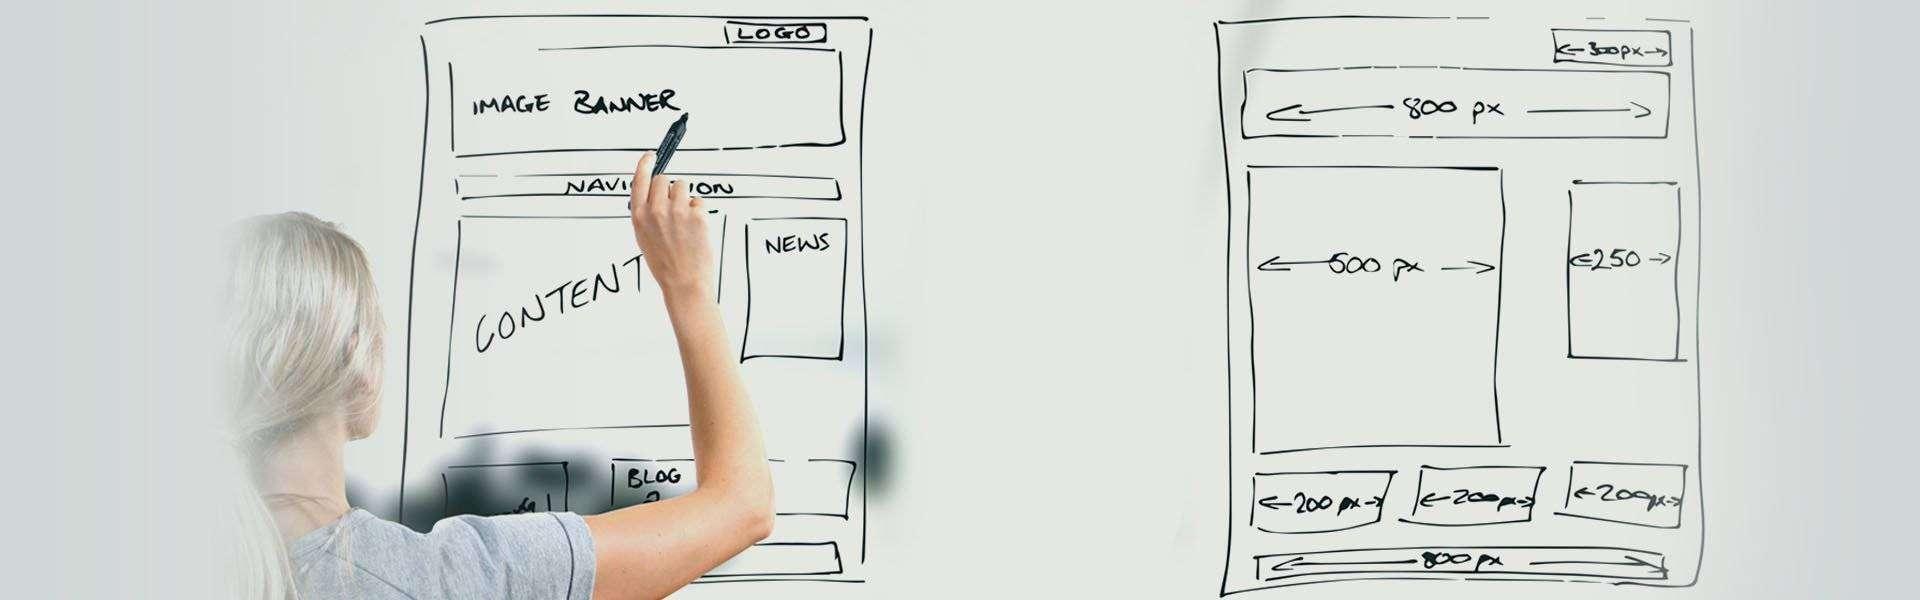 joomla website design development services